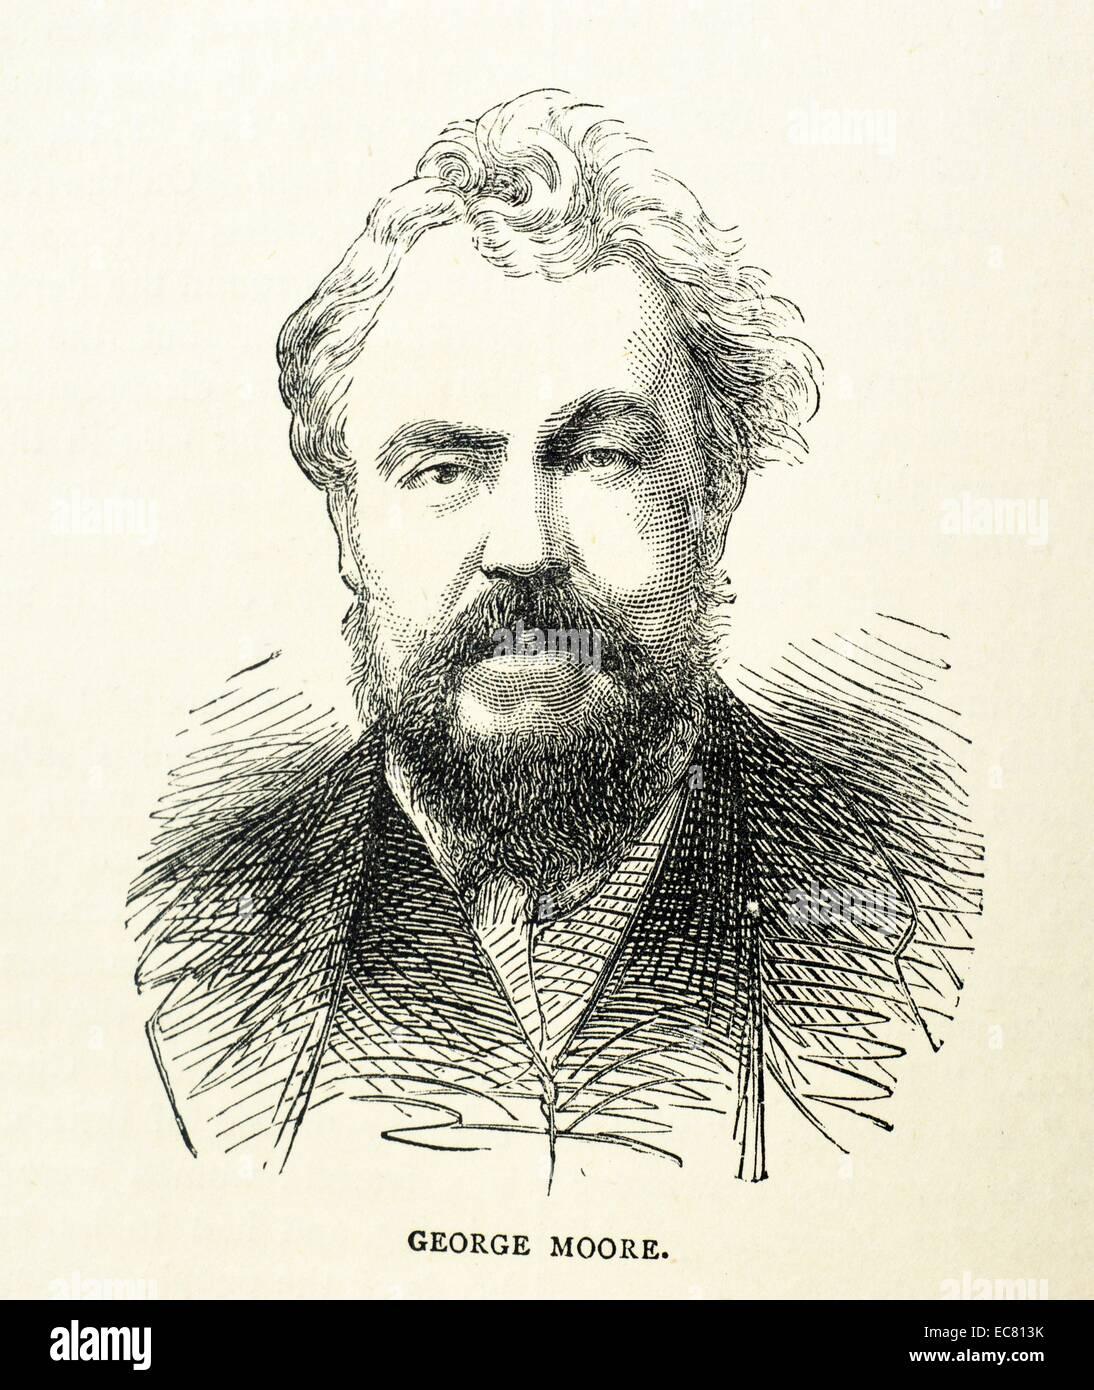 Engraving of George Moore (1852-1933) Irish novelist, short-story writer, poet, art critic, memoirist and dramatist. - Stock Image